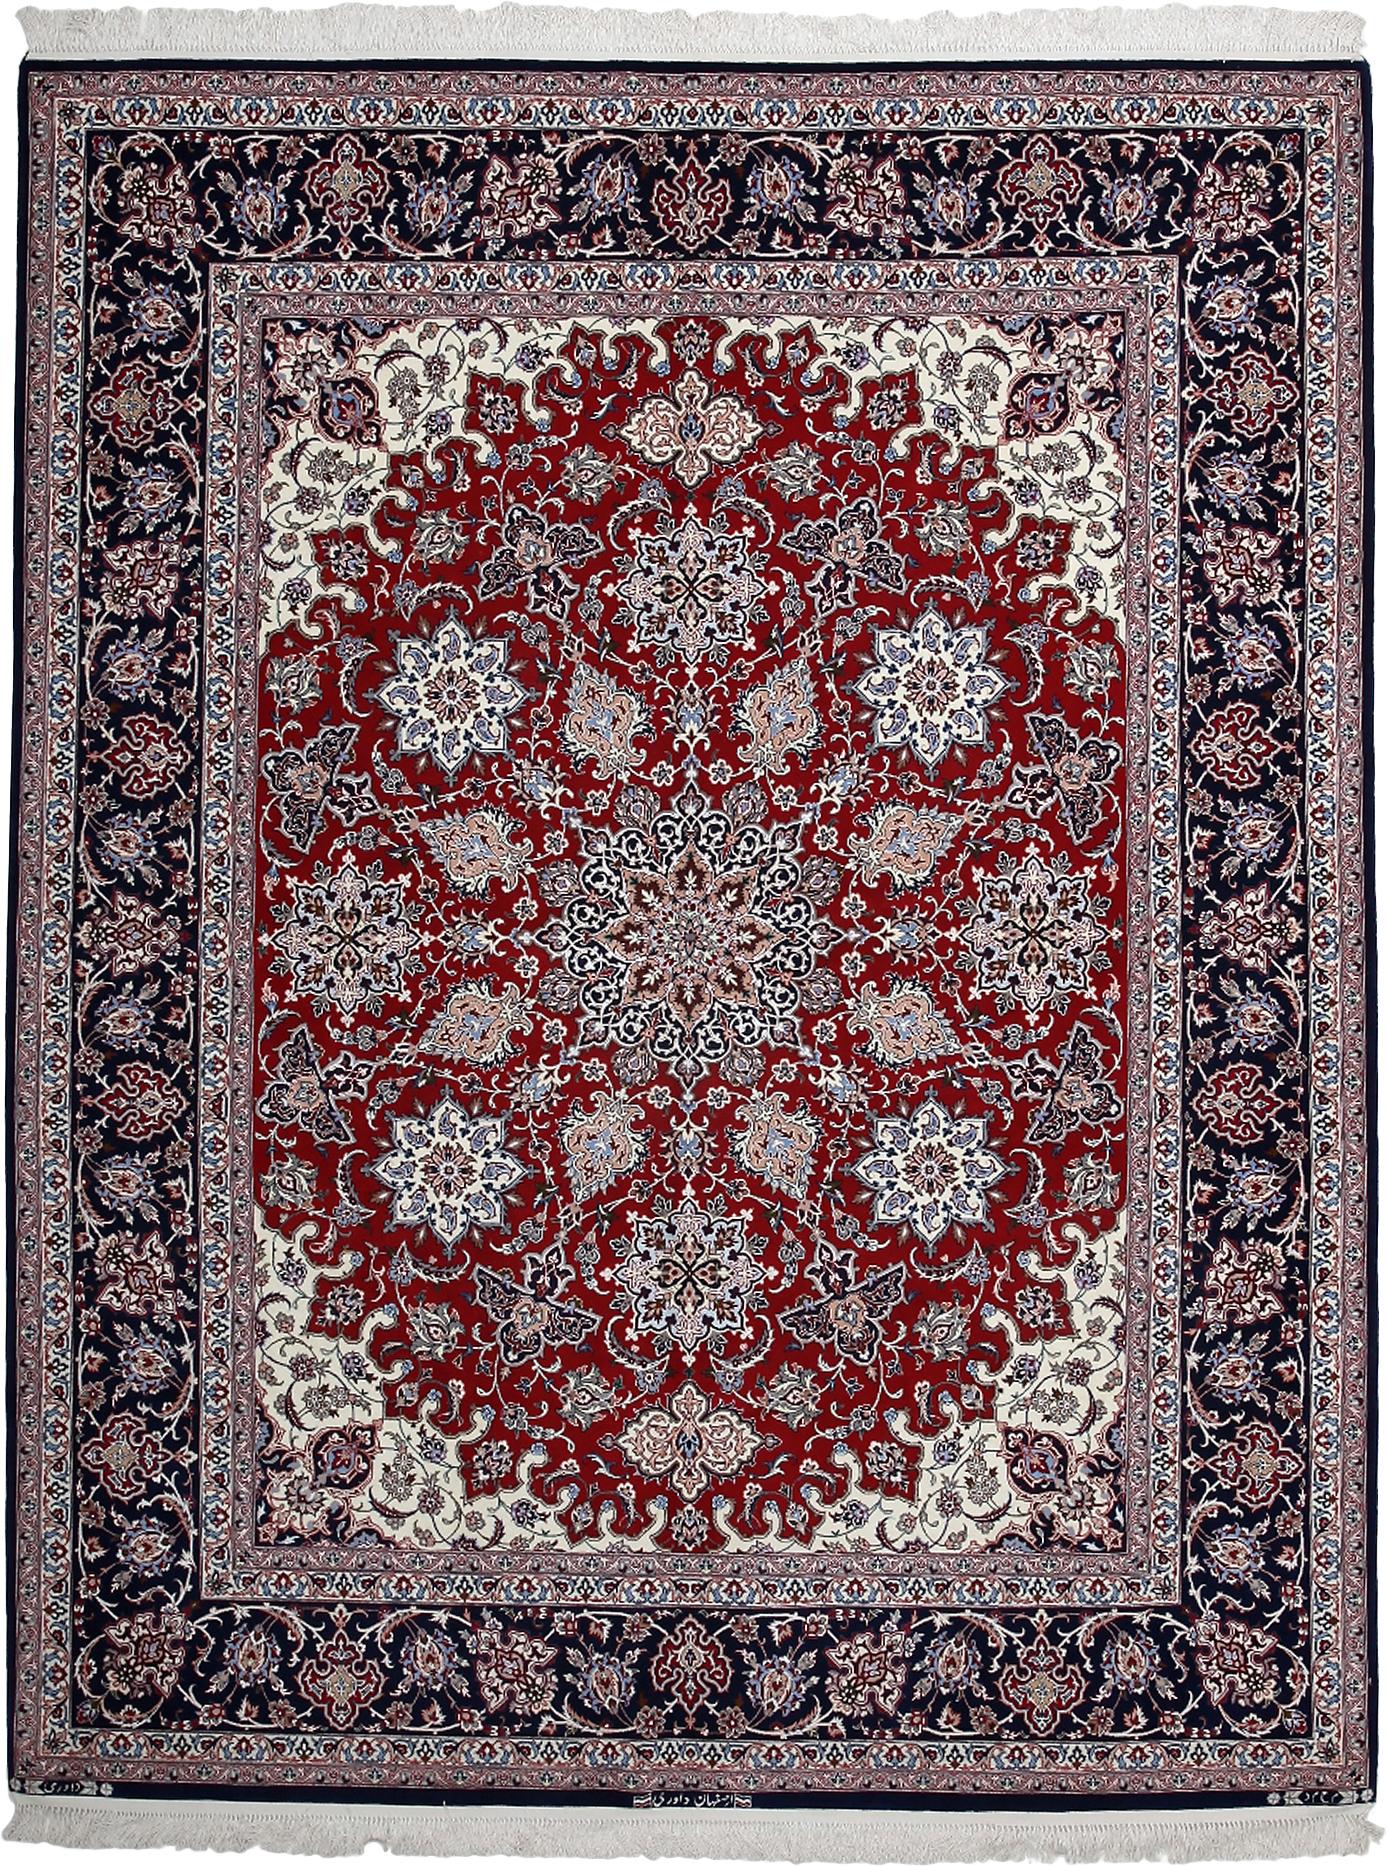 Rugs Isfahan Red Rectangular Area Rug